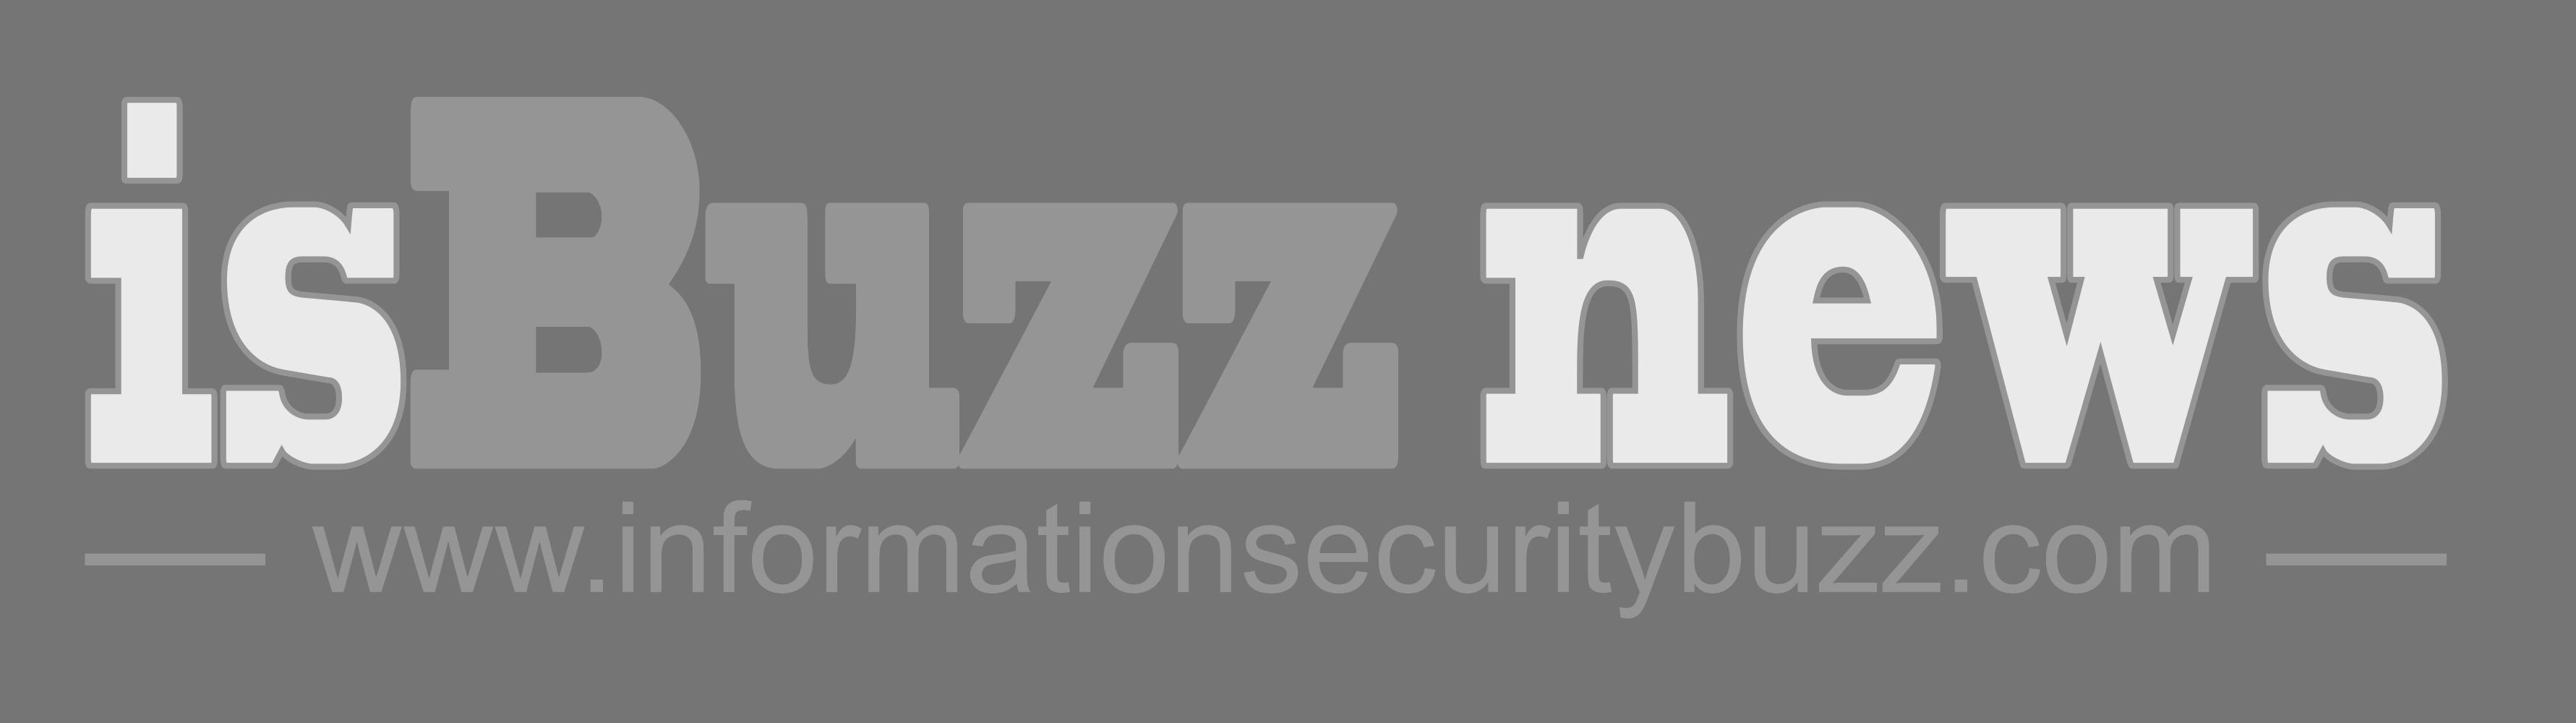 Information Security Buzz